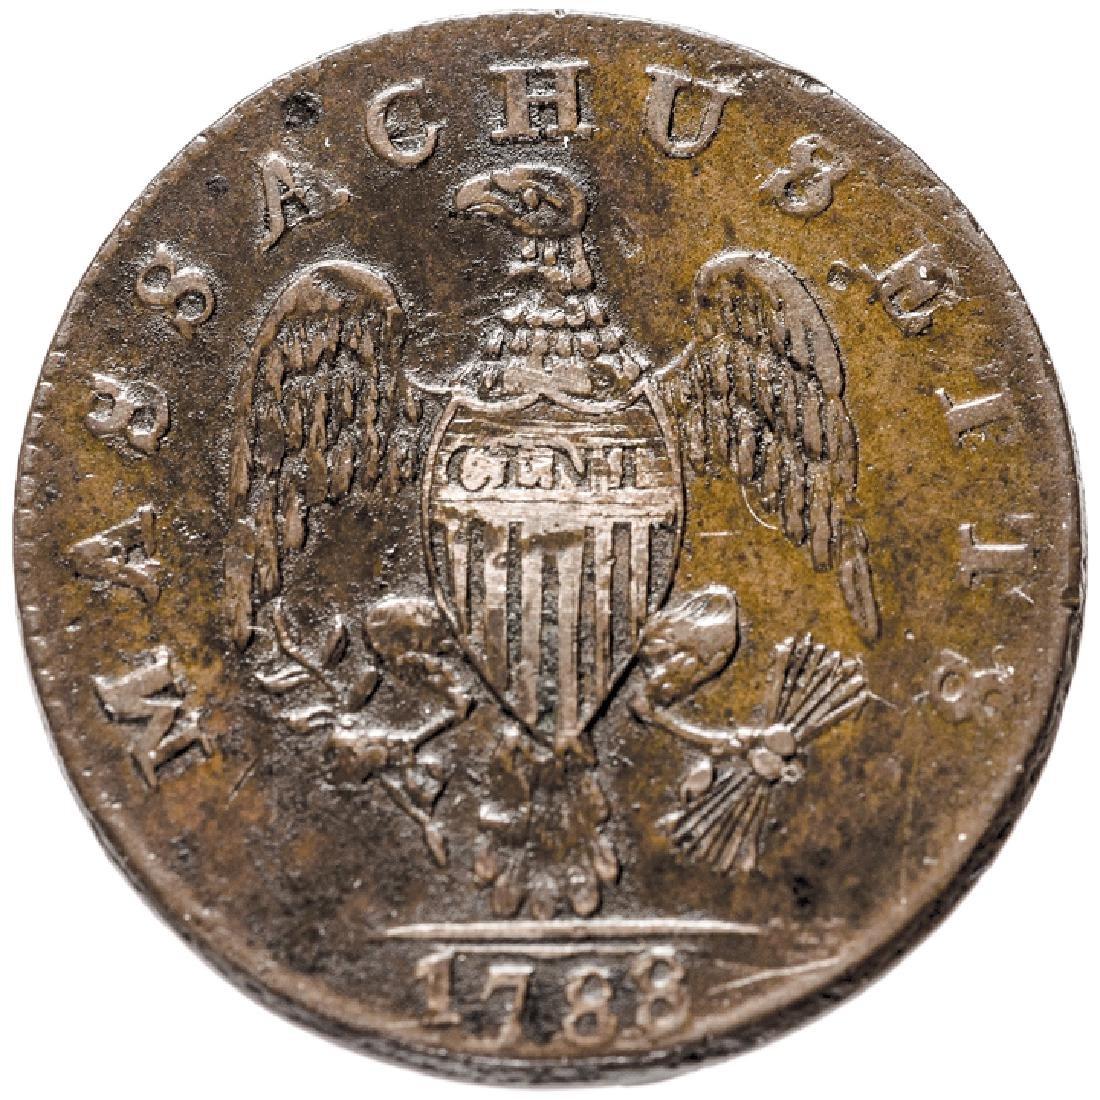 1788 Massachusetts Cent, Ryder 1-D, W-7190 EF-AU - 2